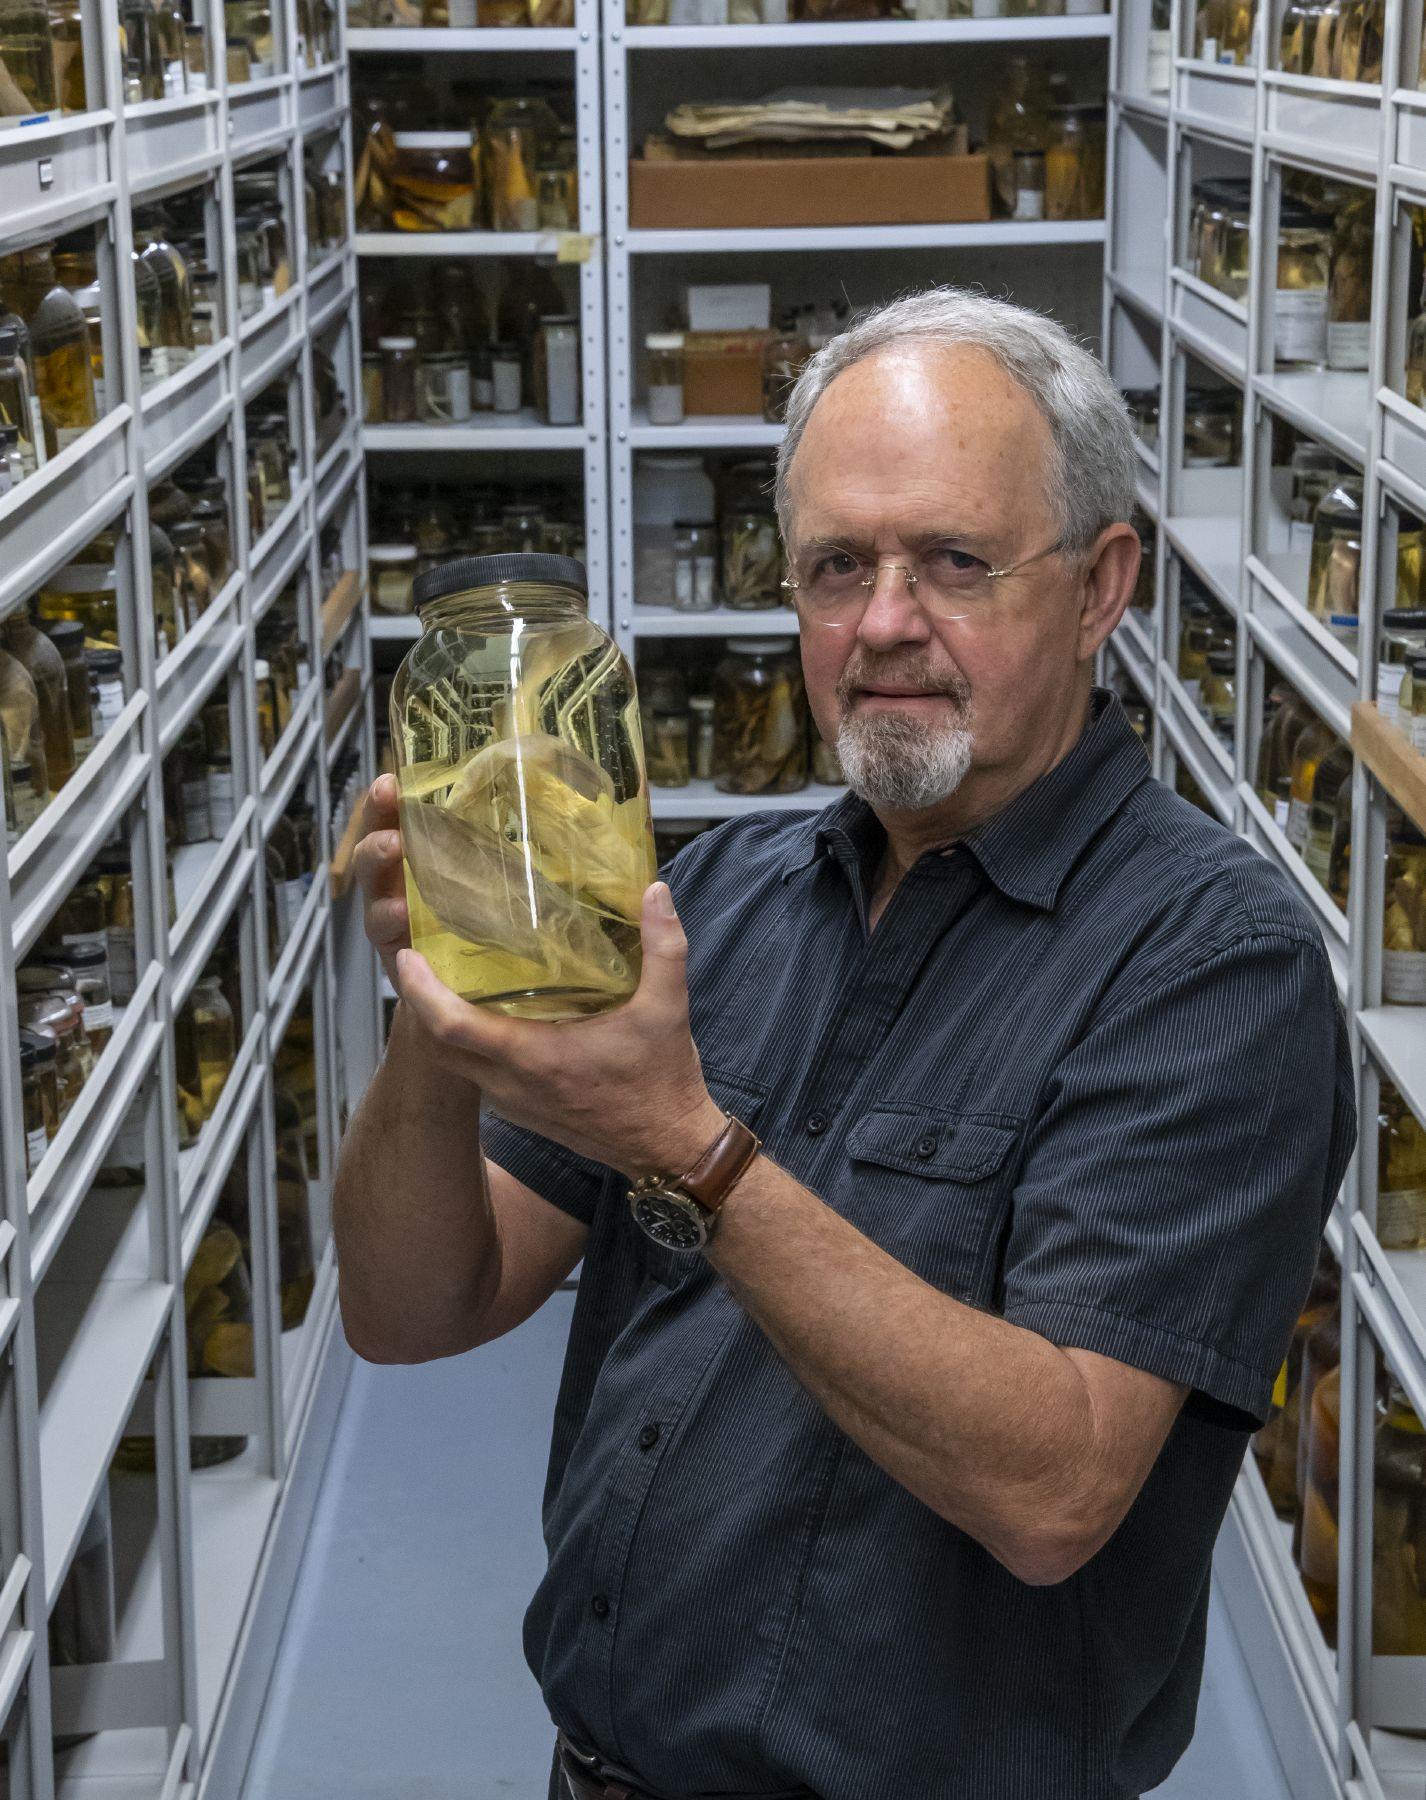 Scientist holding a fish specimen